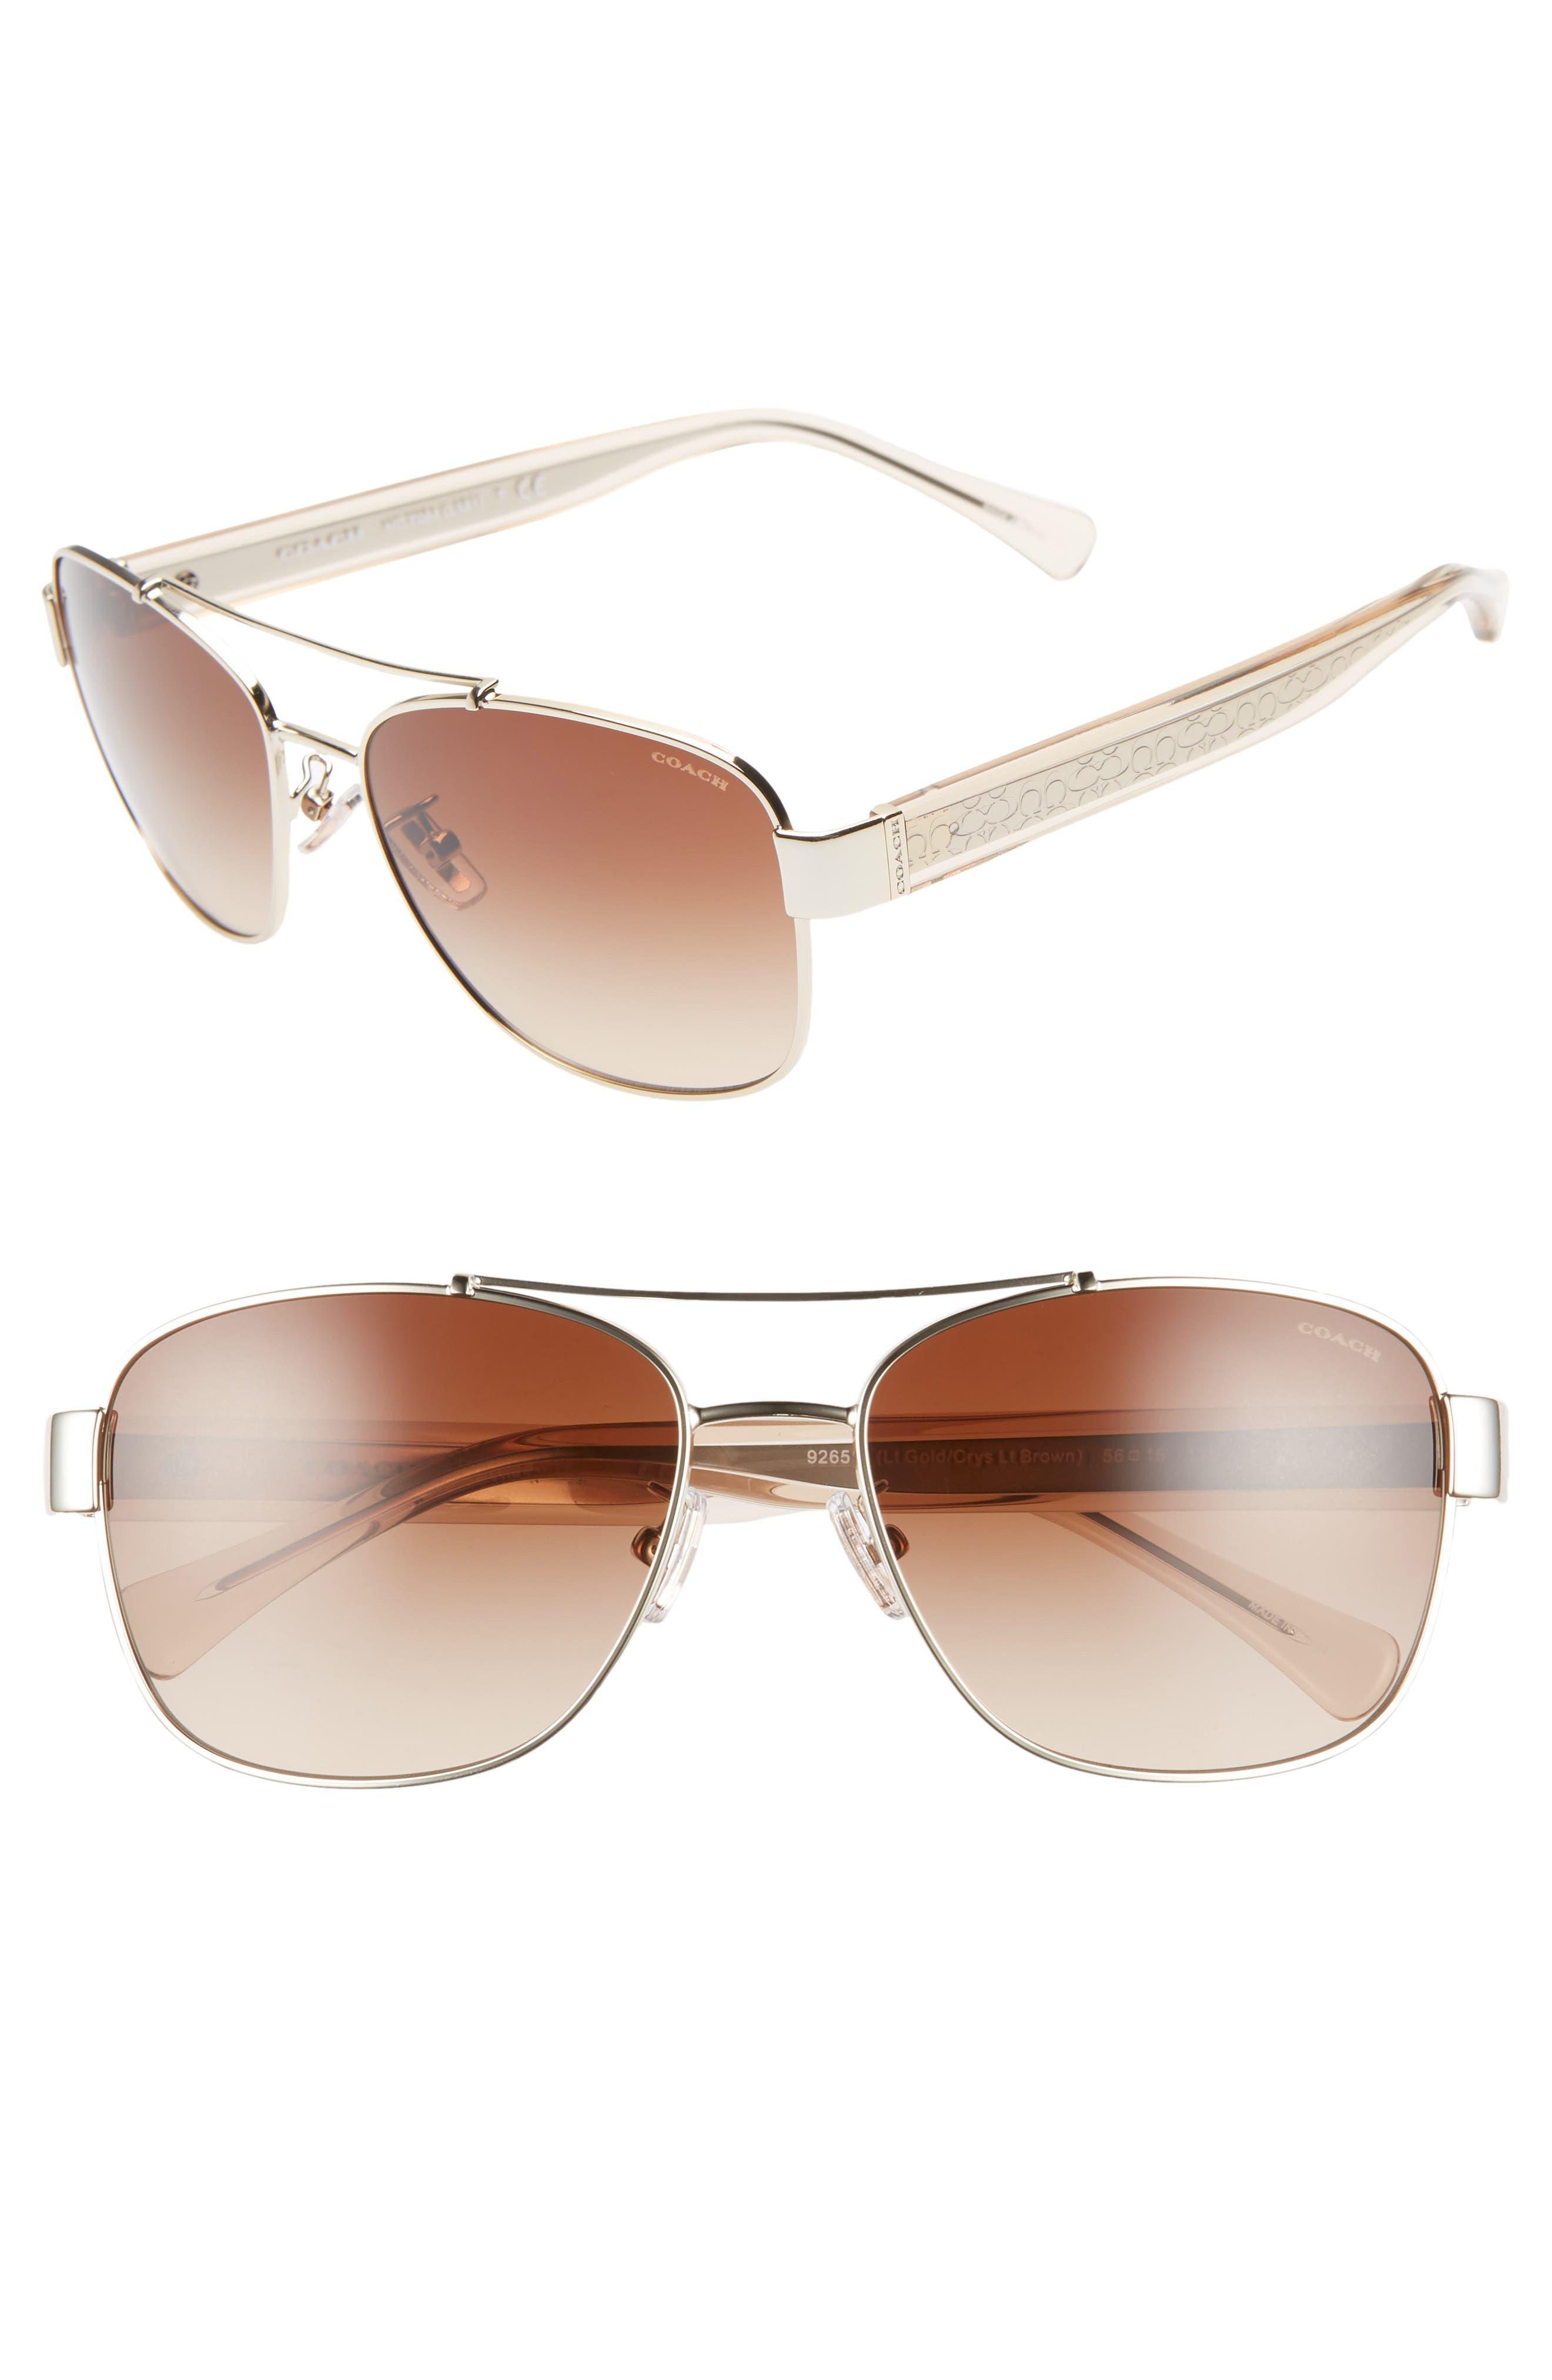 43ce161ec0 COACH Sunglasses for Women